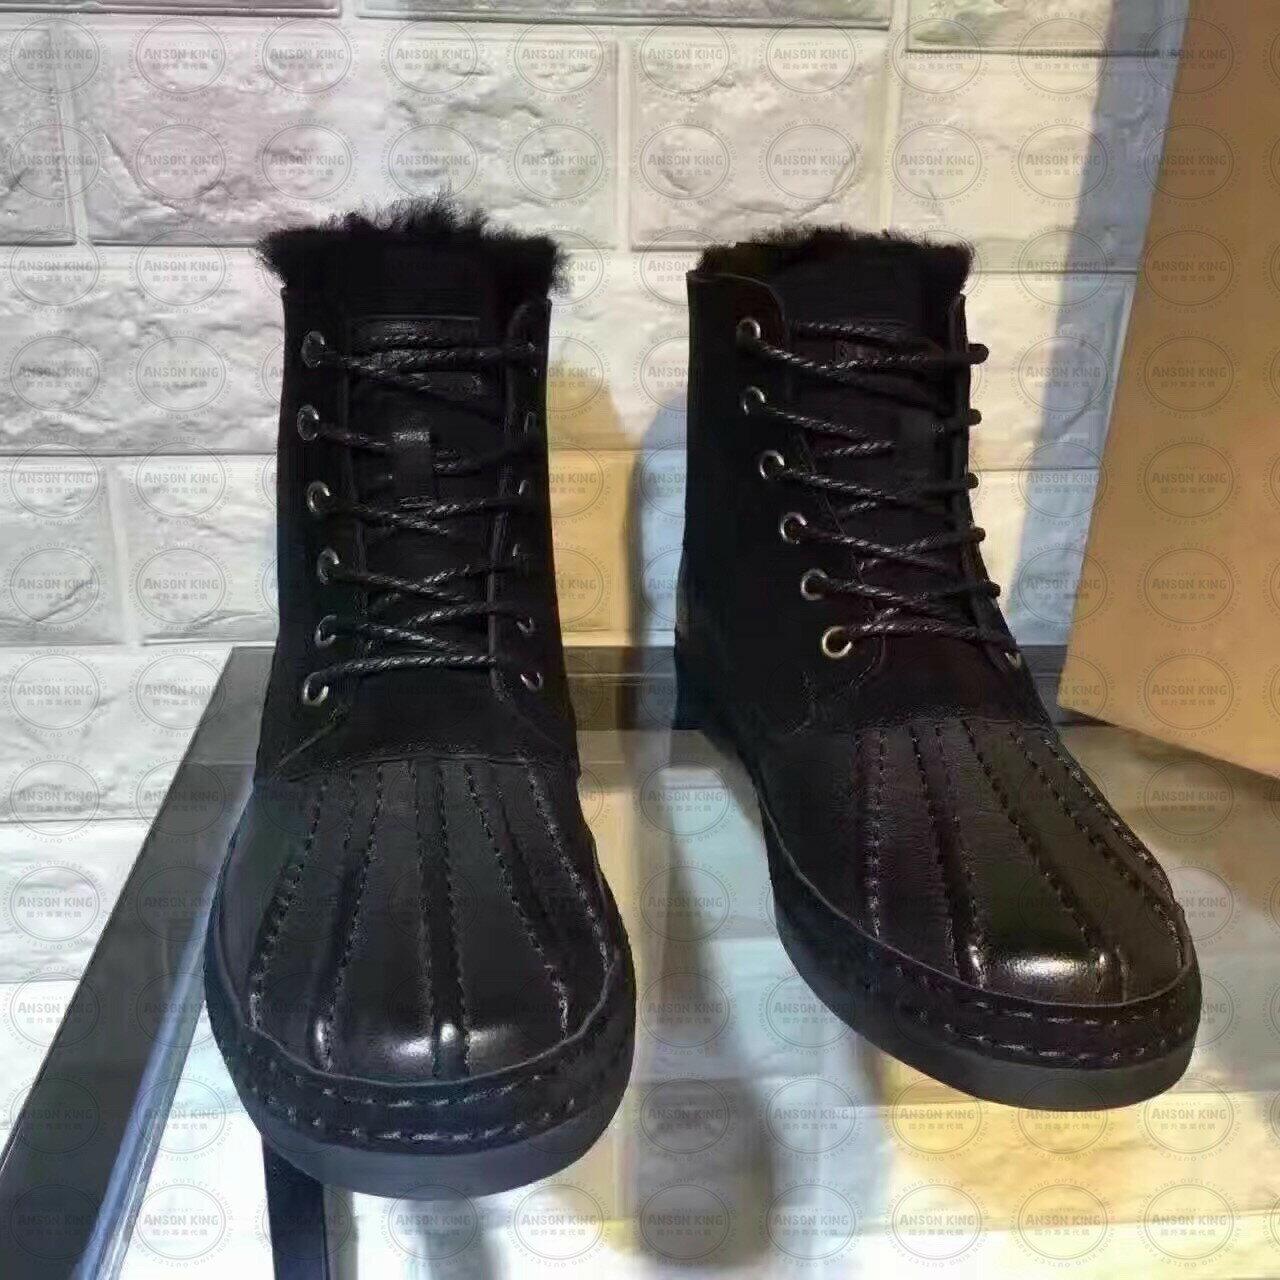 OUTLET正品代購 澳洲 UGG 冬季男款貝殼頭馬丁靴 短靴 保暖 真皮羊皮毛 雪靴 短靴 黑色 1